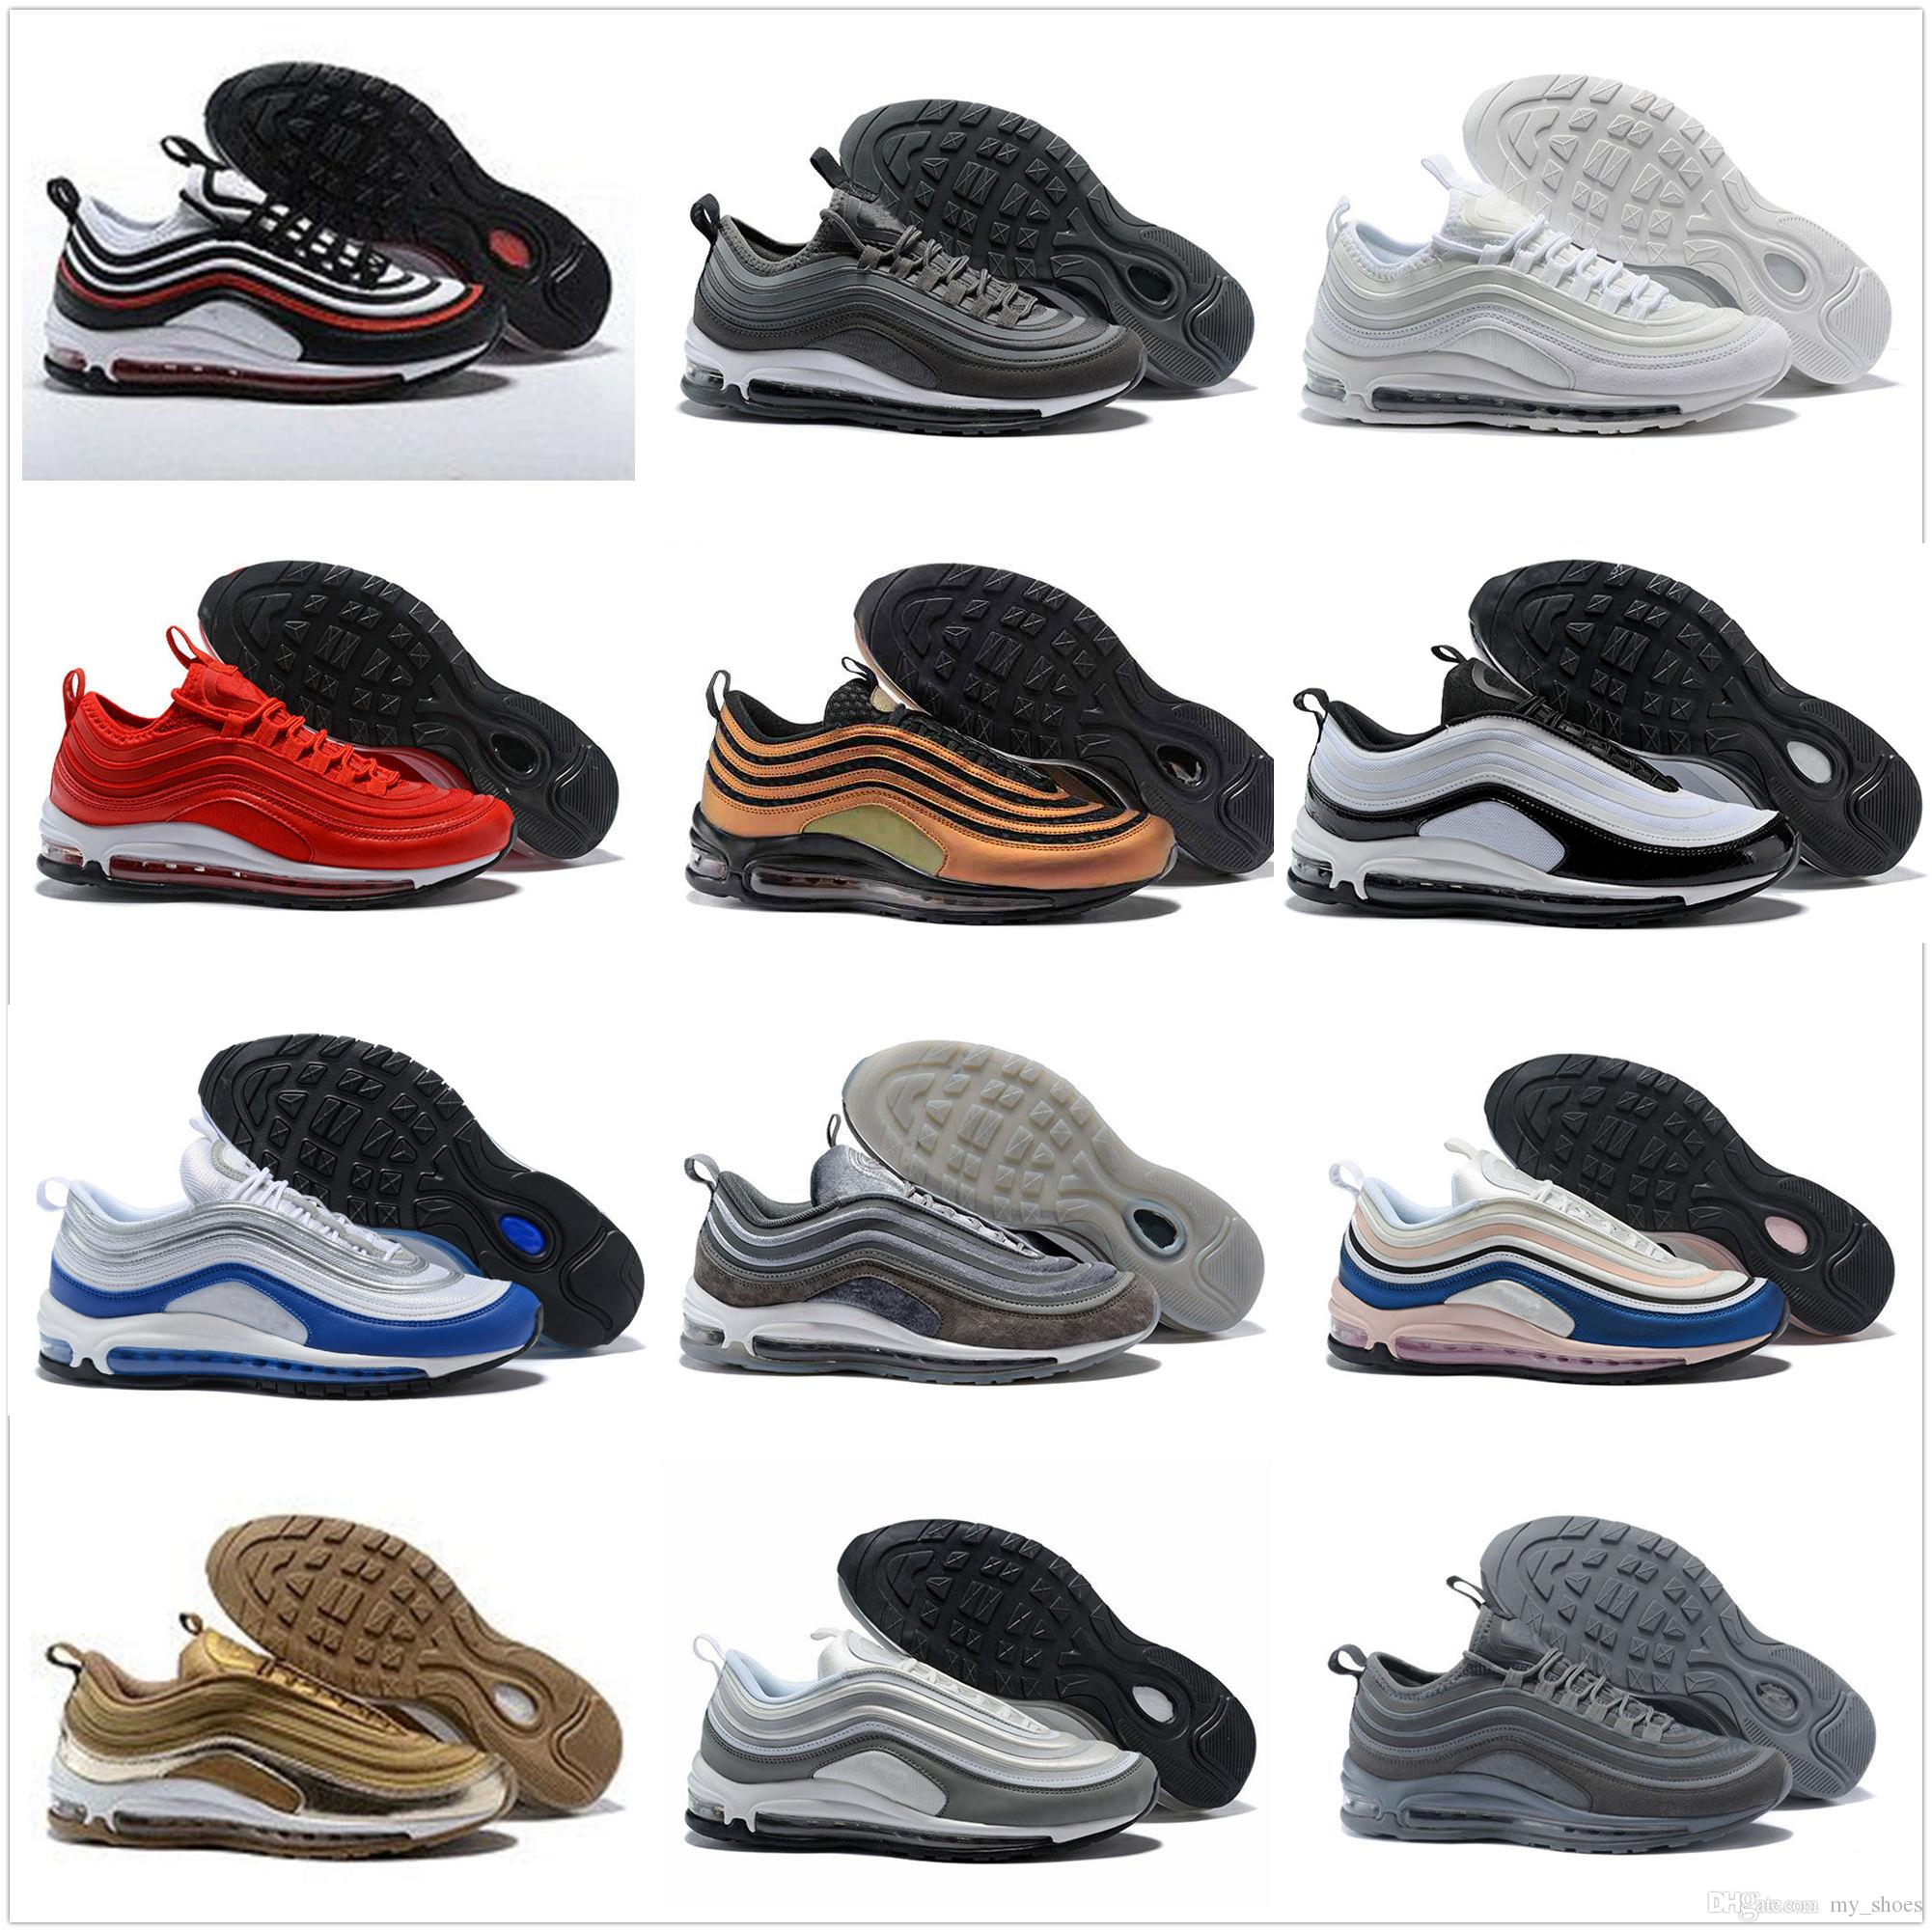 c7bd89203d79d5 2018 New Skepta 97 UL 17 OG Running Shoes Mens Trainers White Black ...